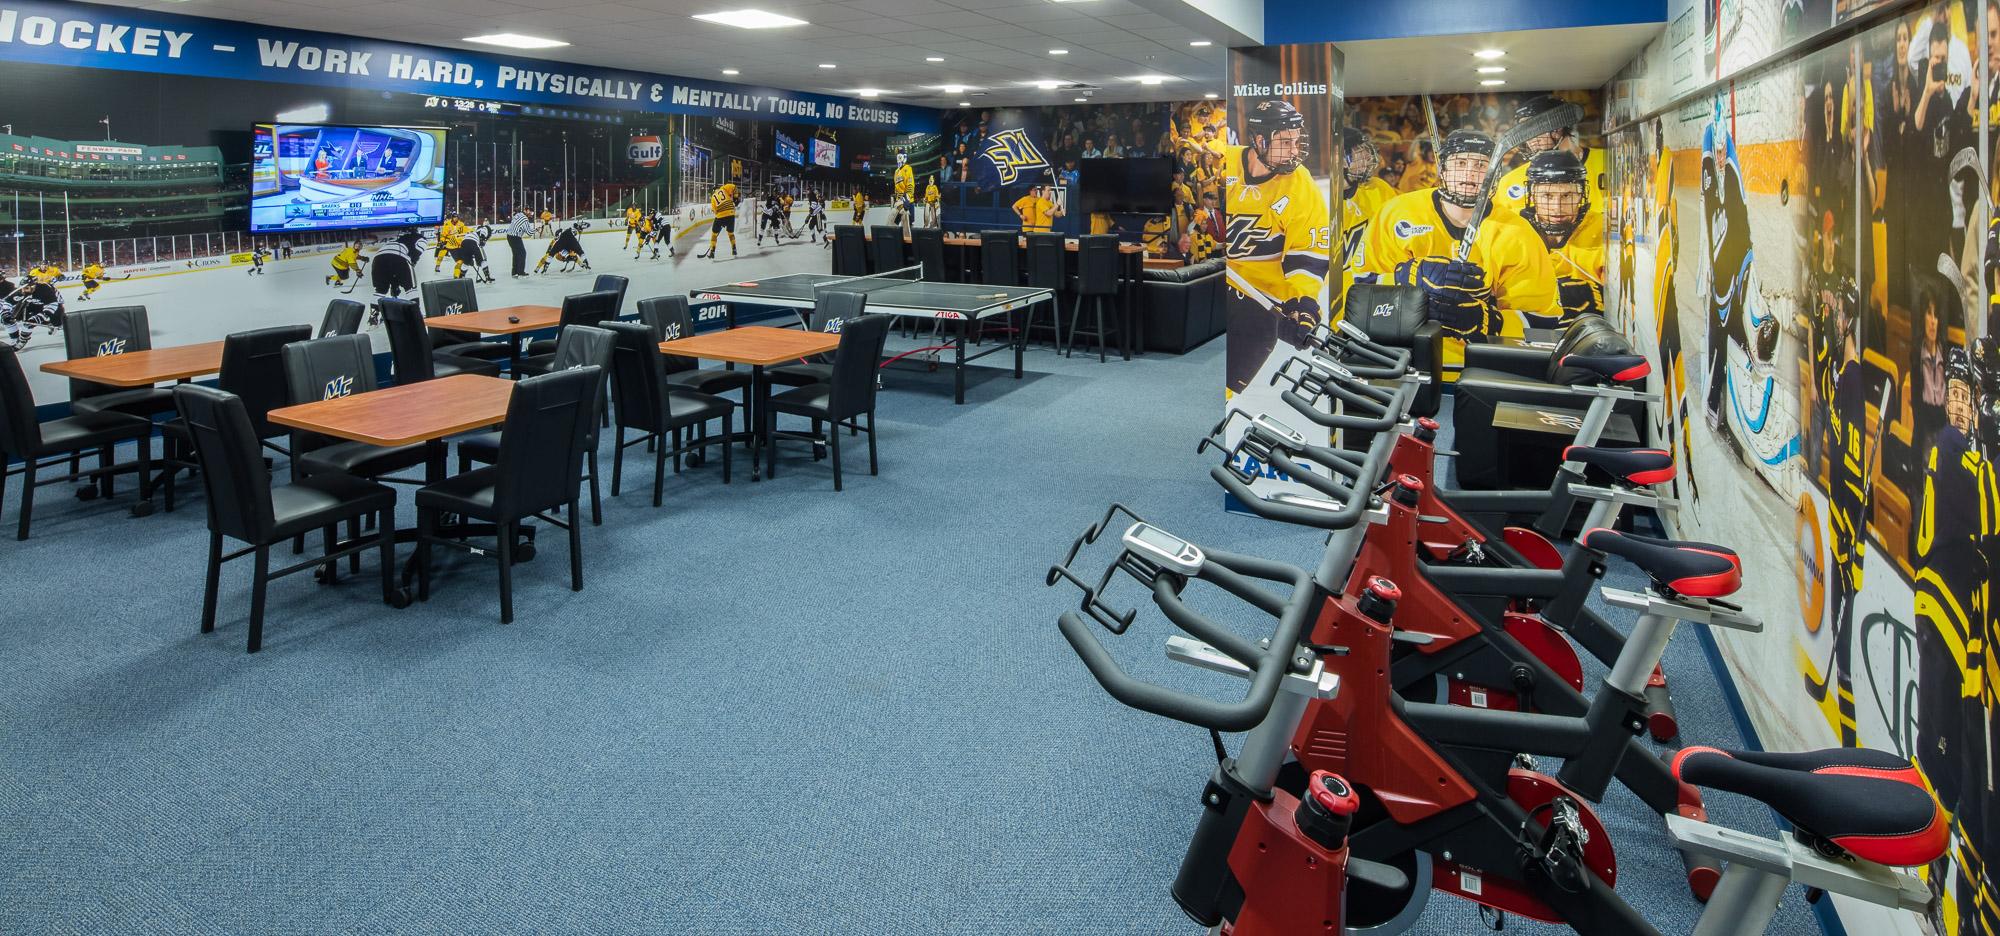 Merrimack College Hockey Locker Rooms - Channel Building Company